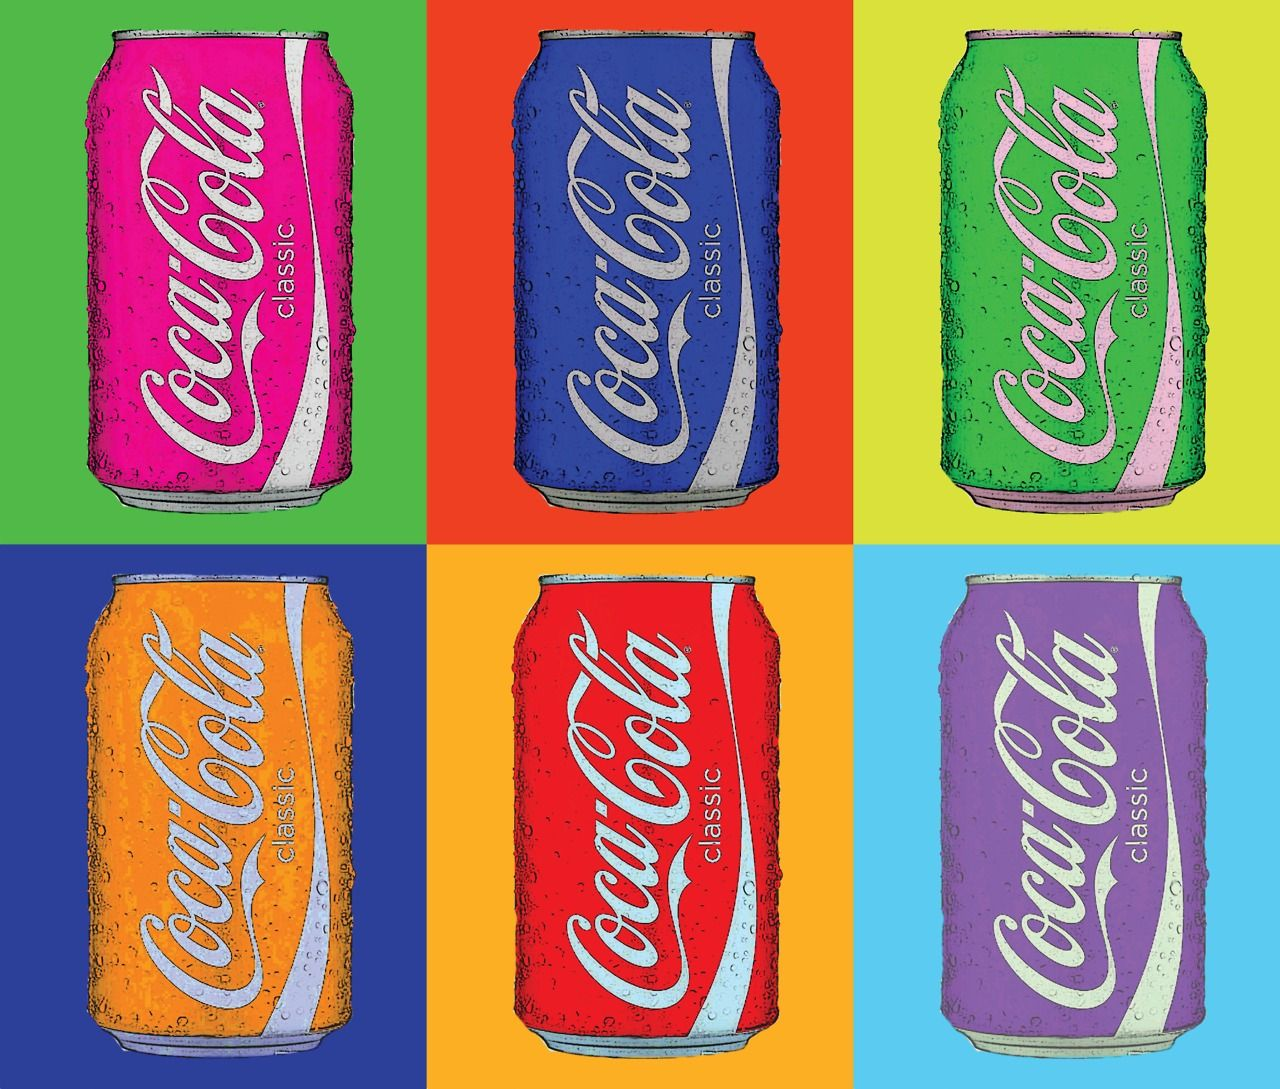 Bien-aimé cocacola | Tumblr | open happiness | Pinterest | Warhol, Art  TA62